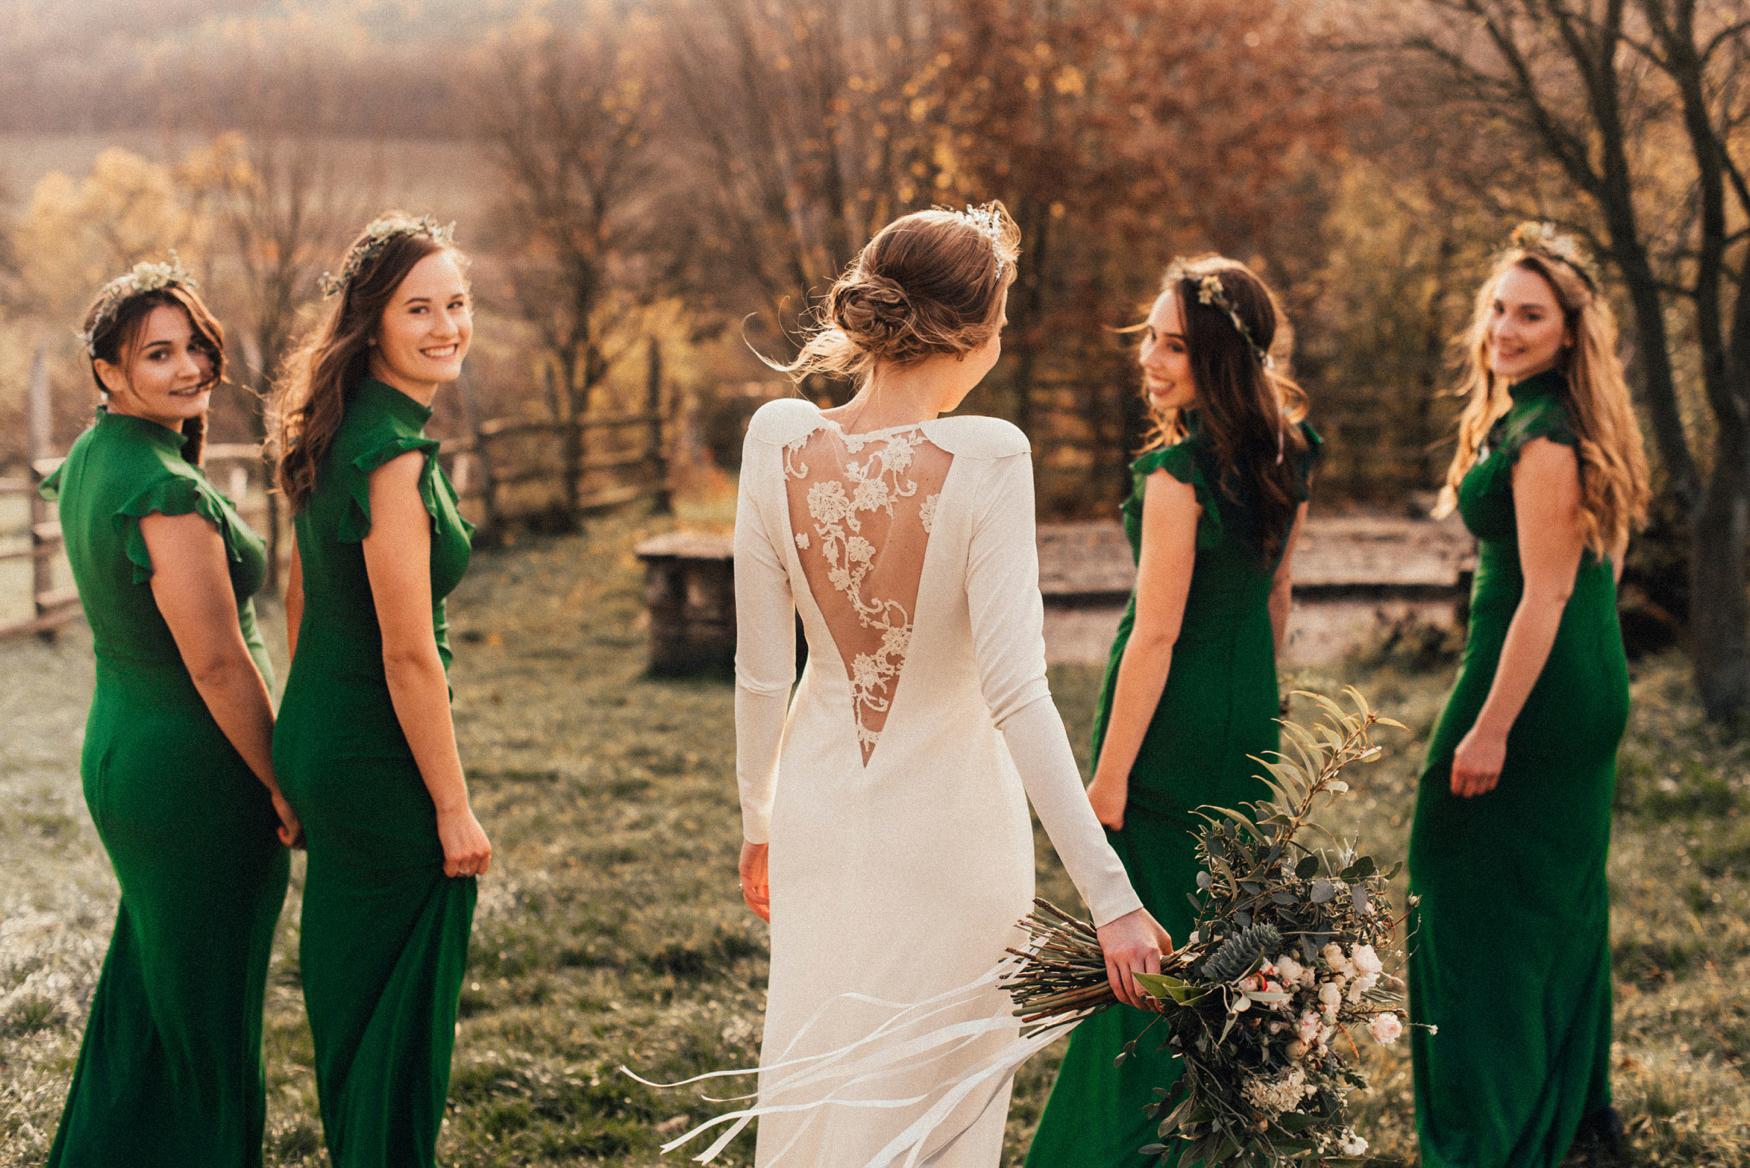 2 prague wedding photographer - boho svatba zikmundov032.jpg